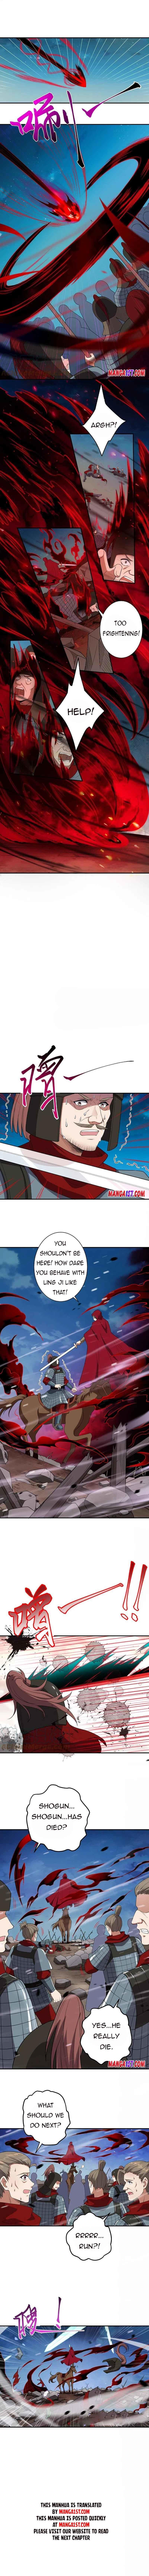 Against The Gods Chapter 394 page 5 - Mangakakalots.com